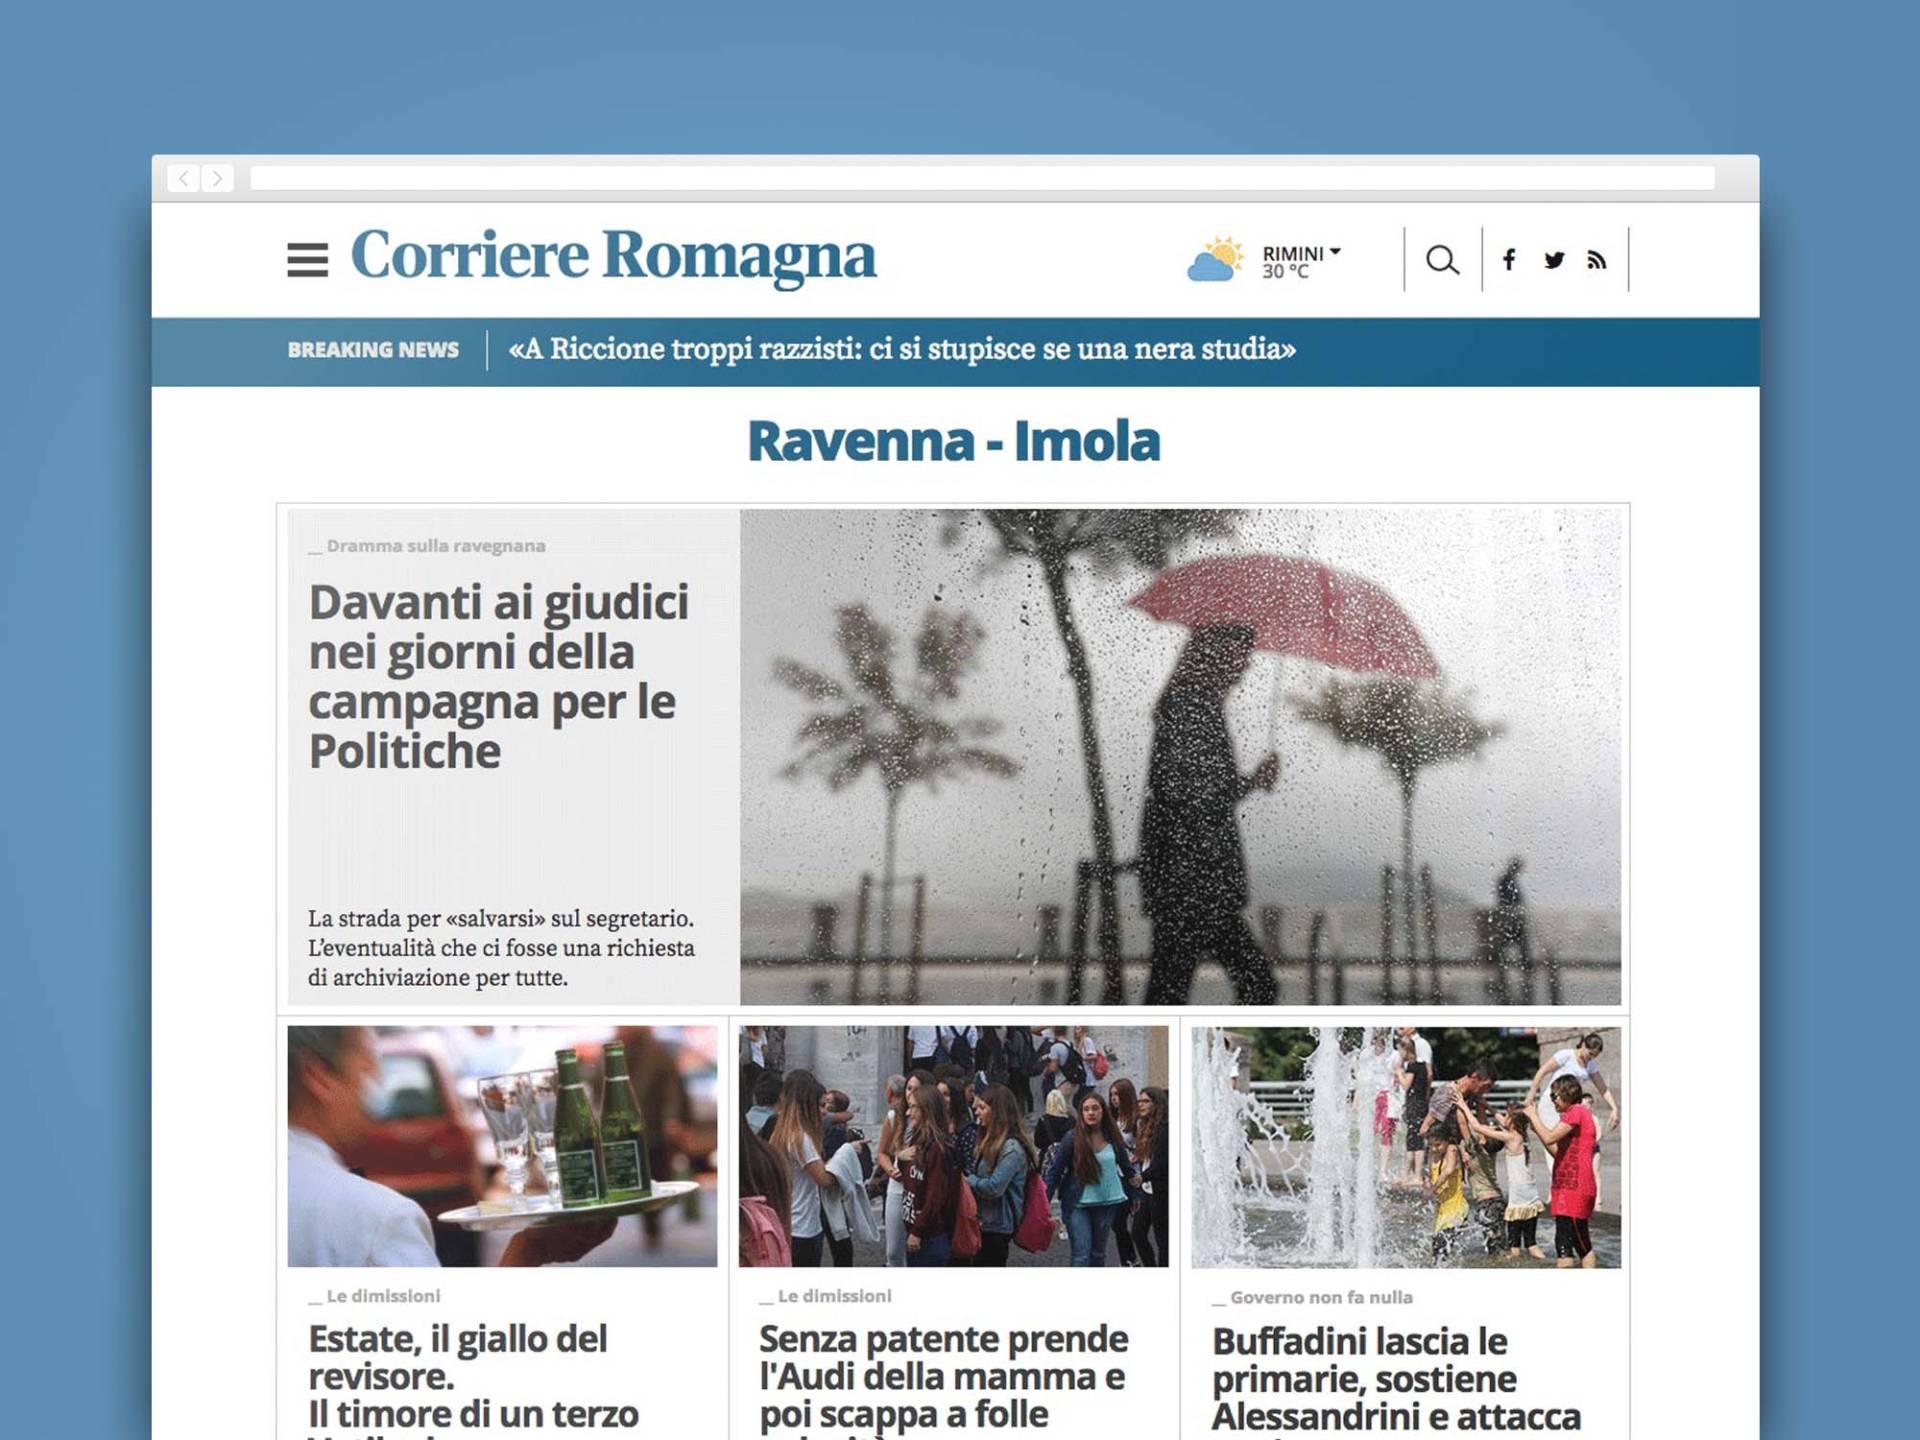 Corriere_Romagna_web_07_Wenceslau_News_Design